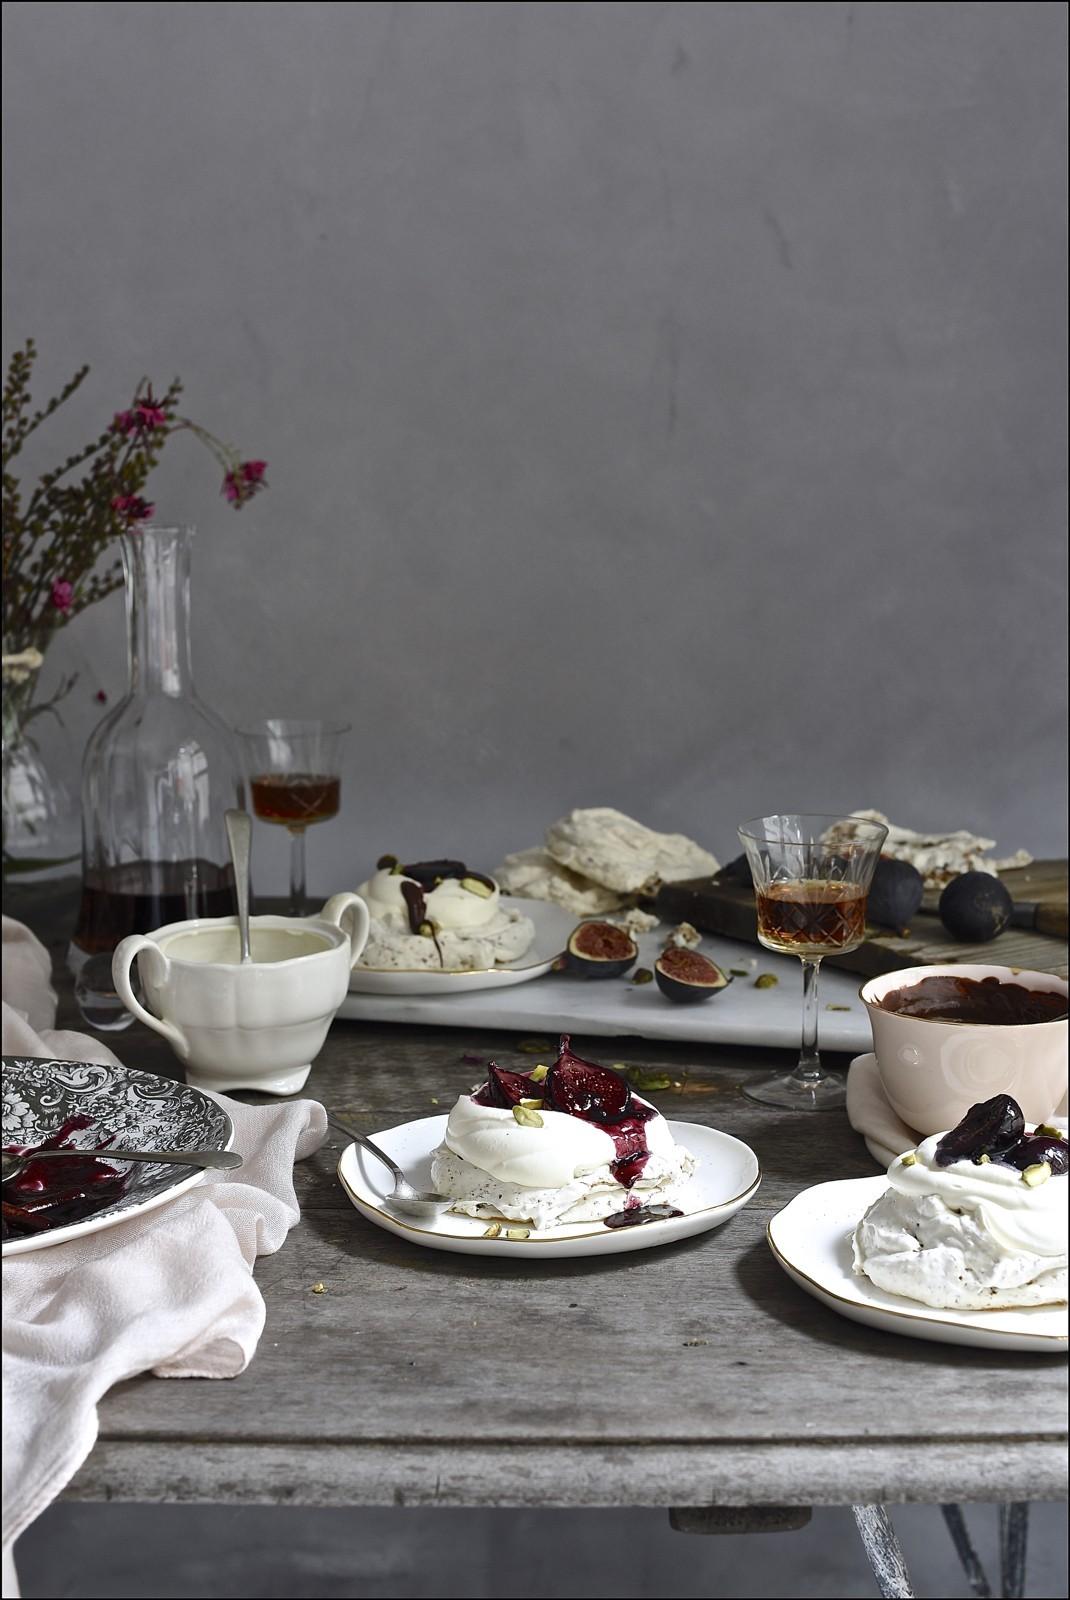 Hot cross bun pavlova with red wine figs | Bibbyskitchen dessert recipes